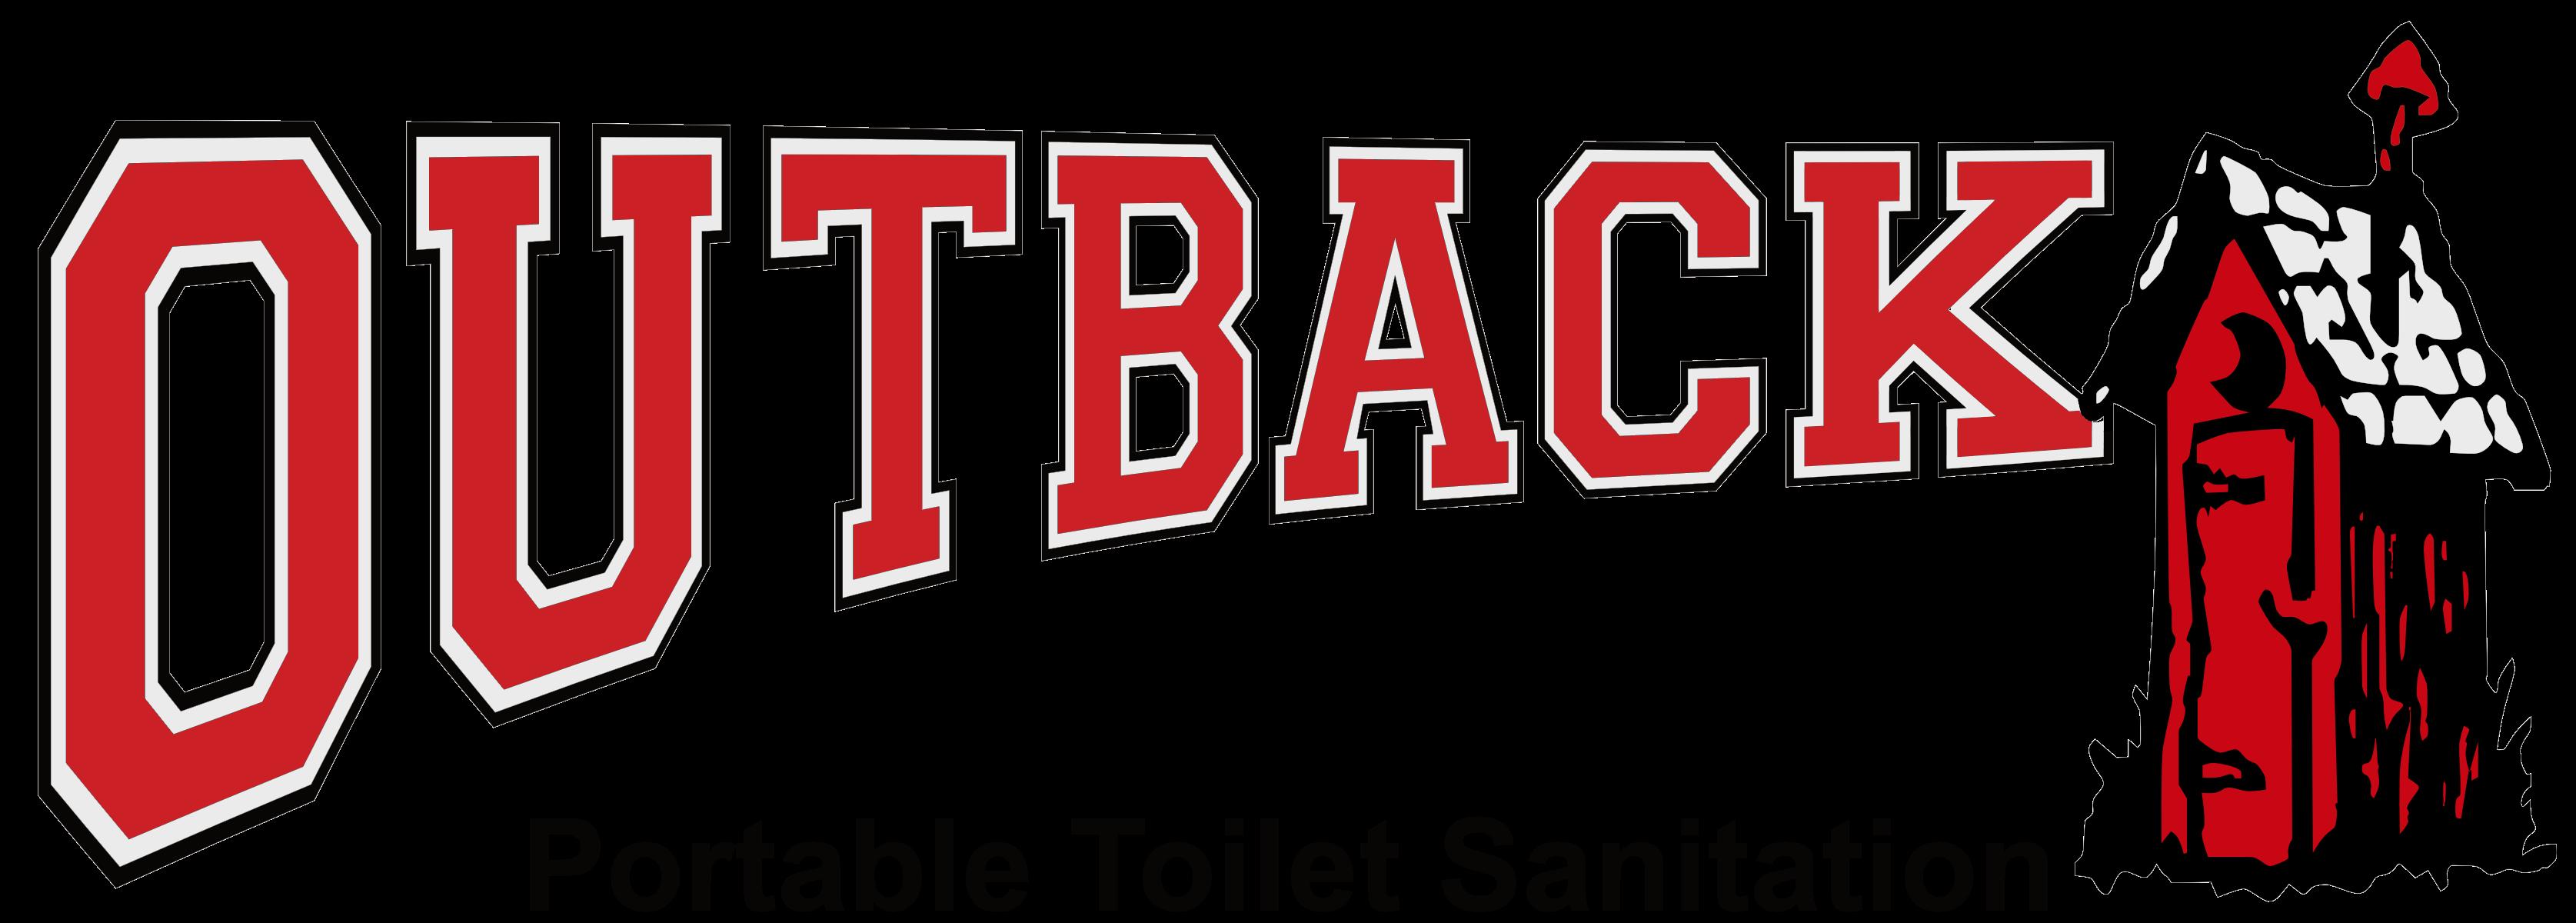 Portable Sanitation Services : Outback portable toilet services